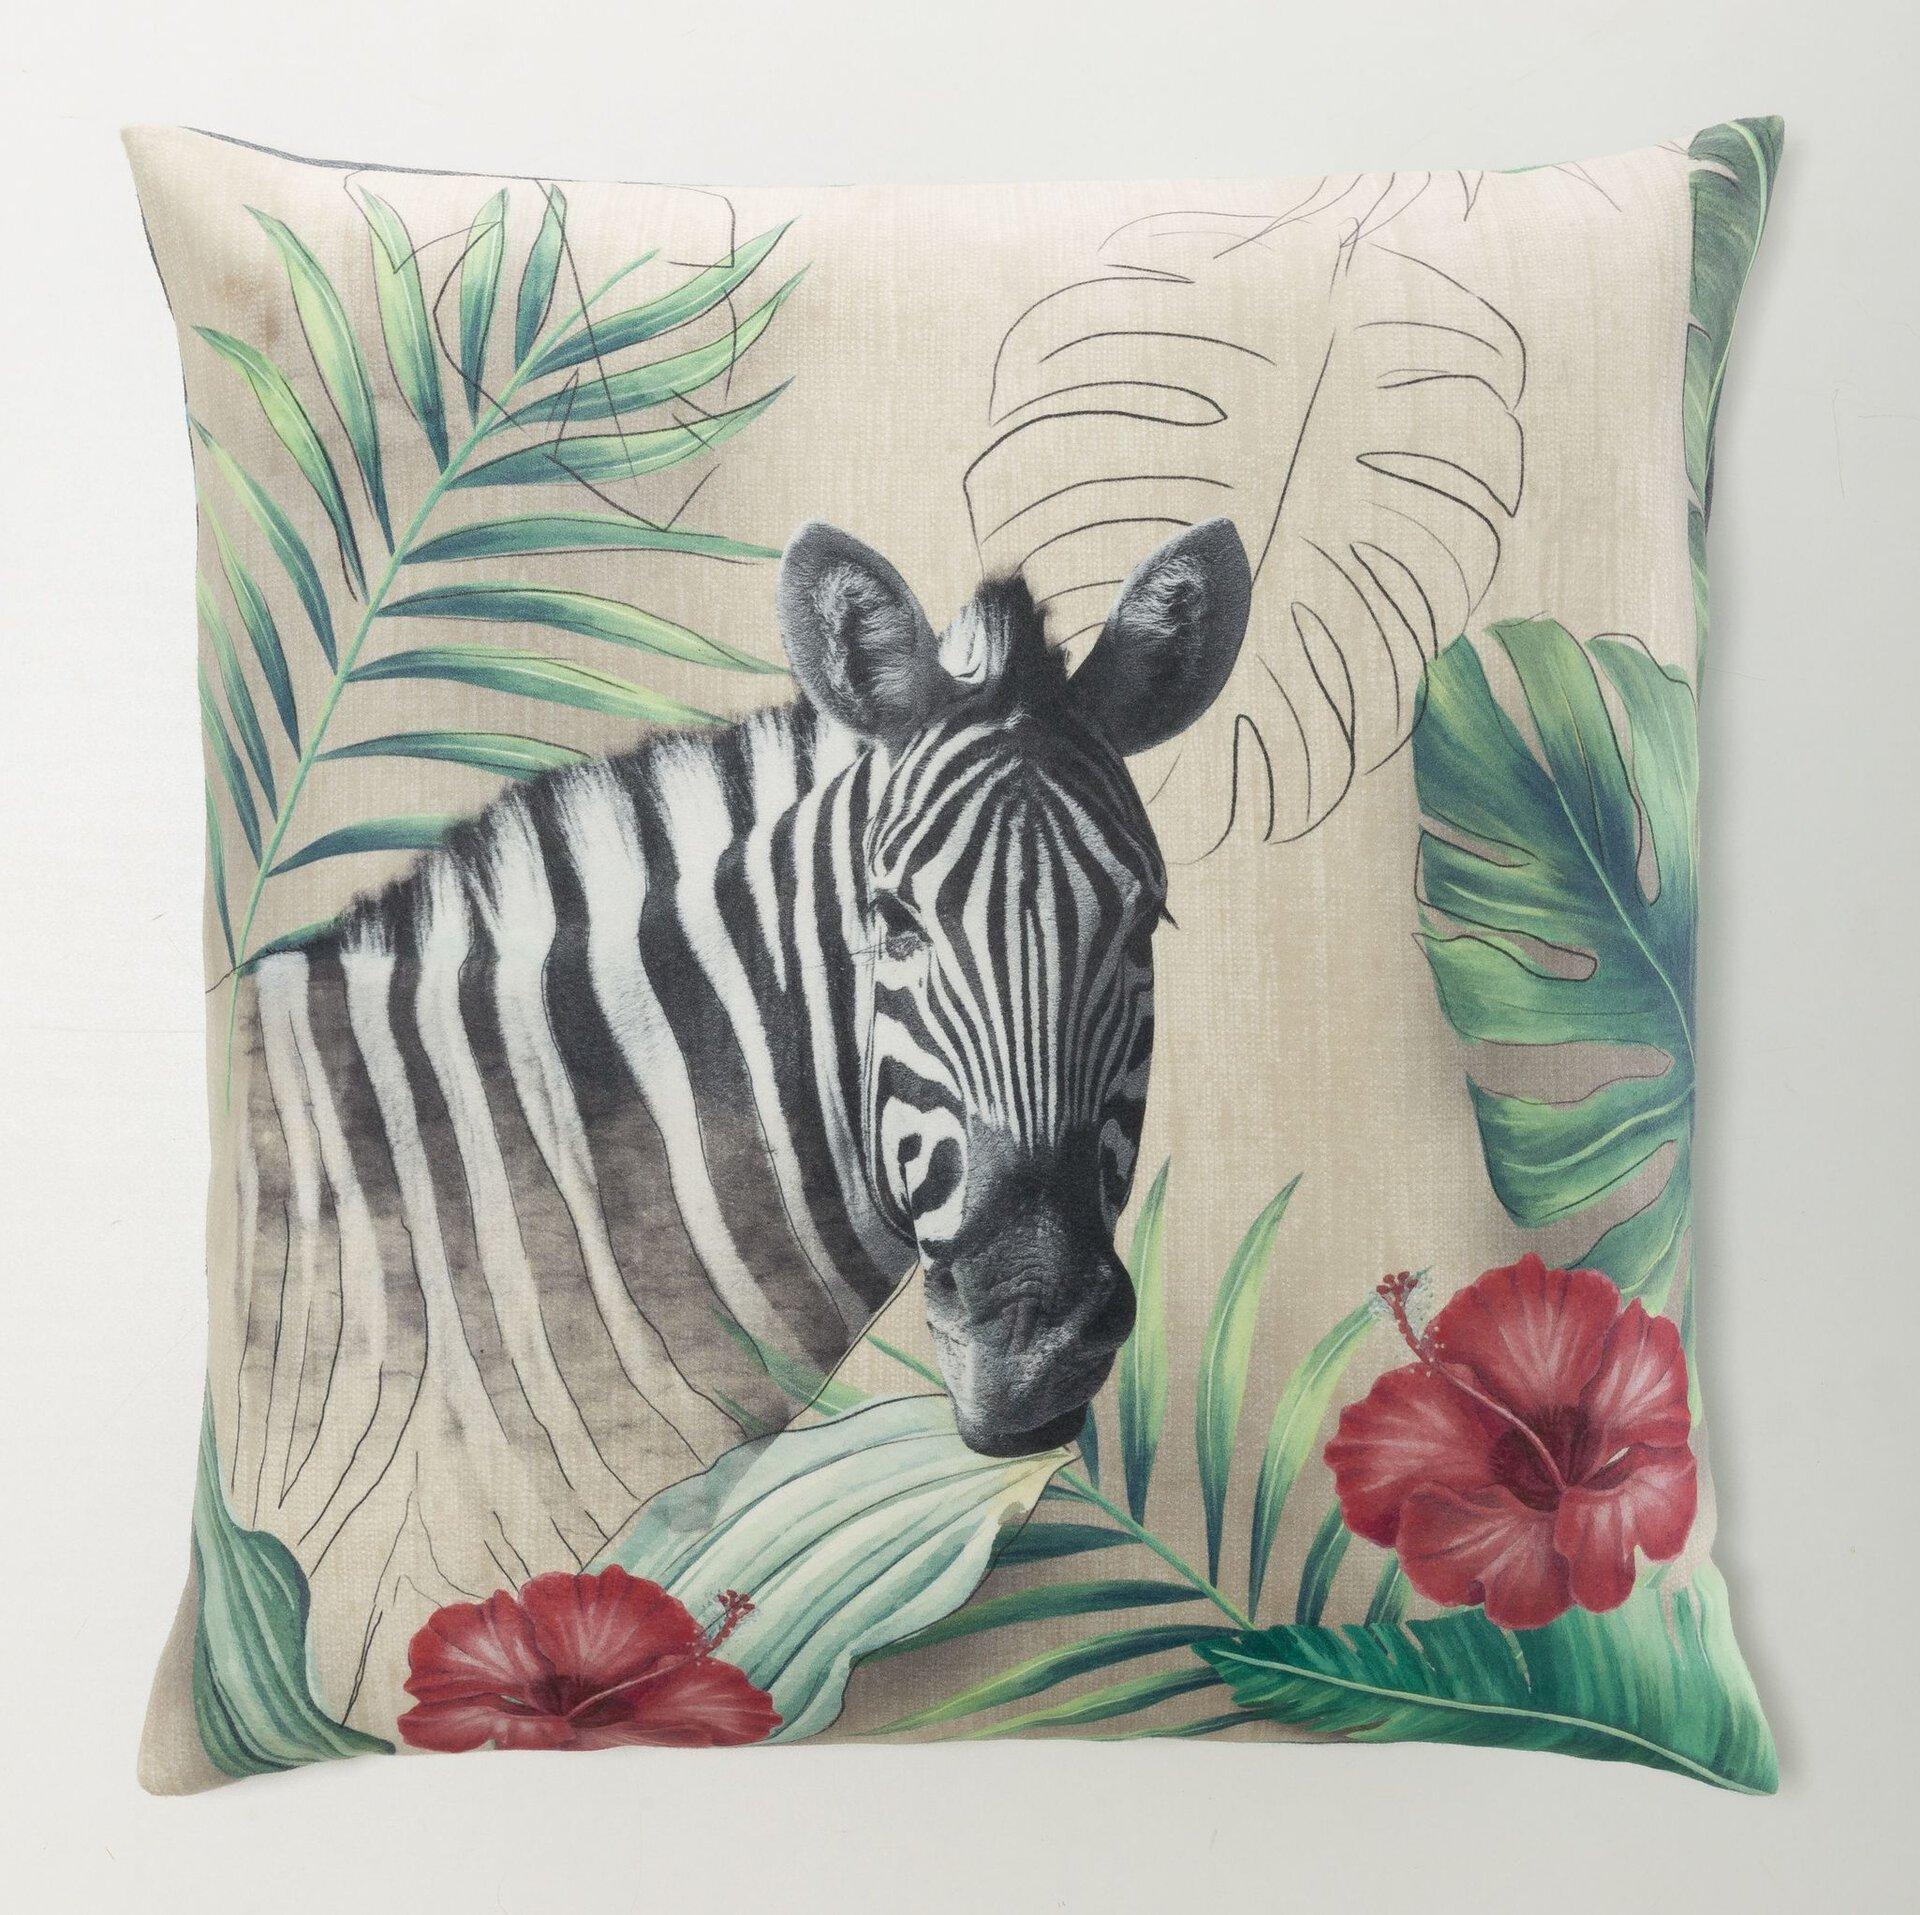 Dekokissen Safari Zebra Casa Nova Textil mehrfarbig 50 x 50 cm